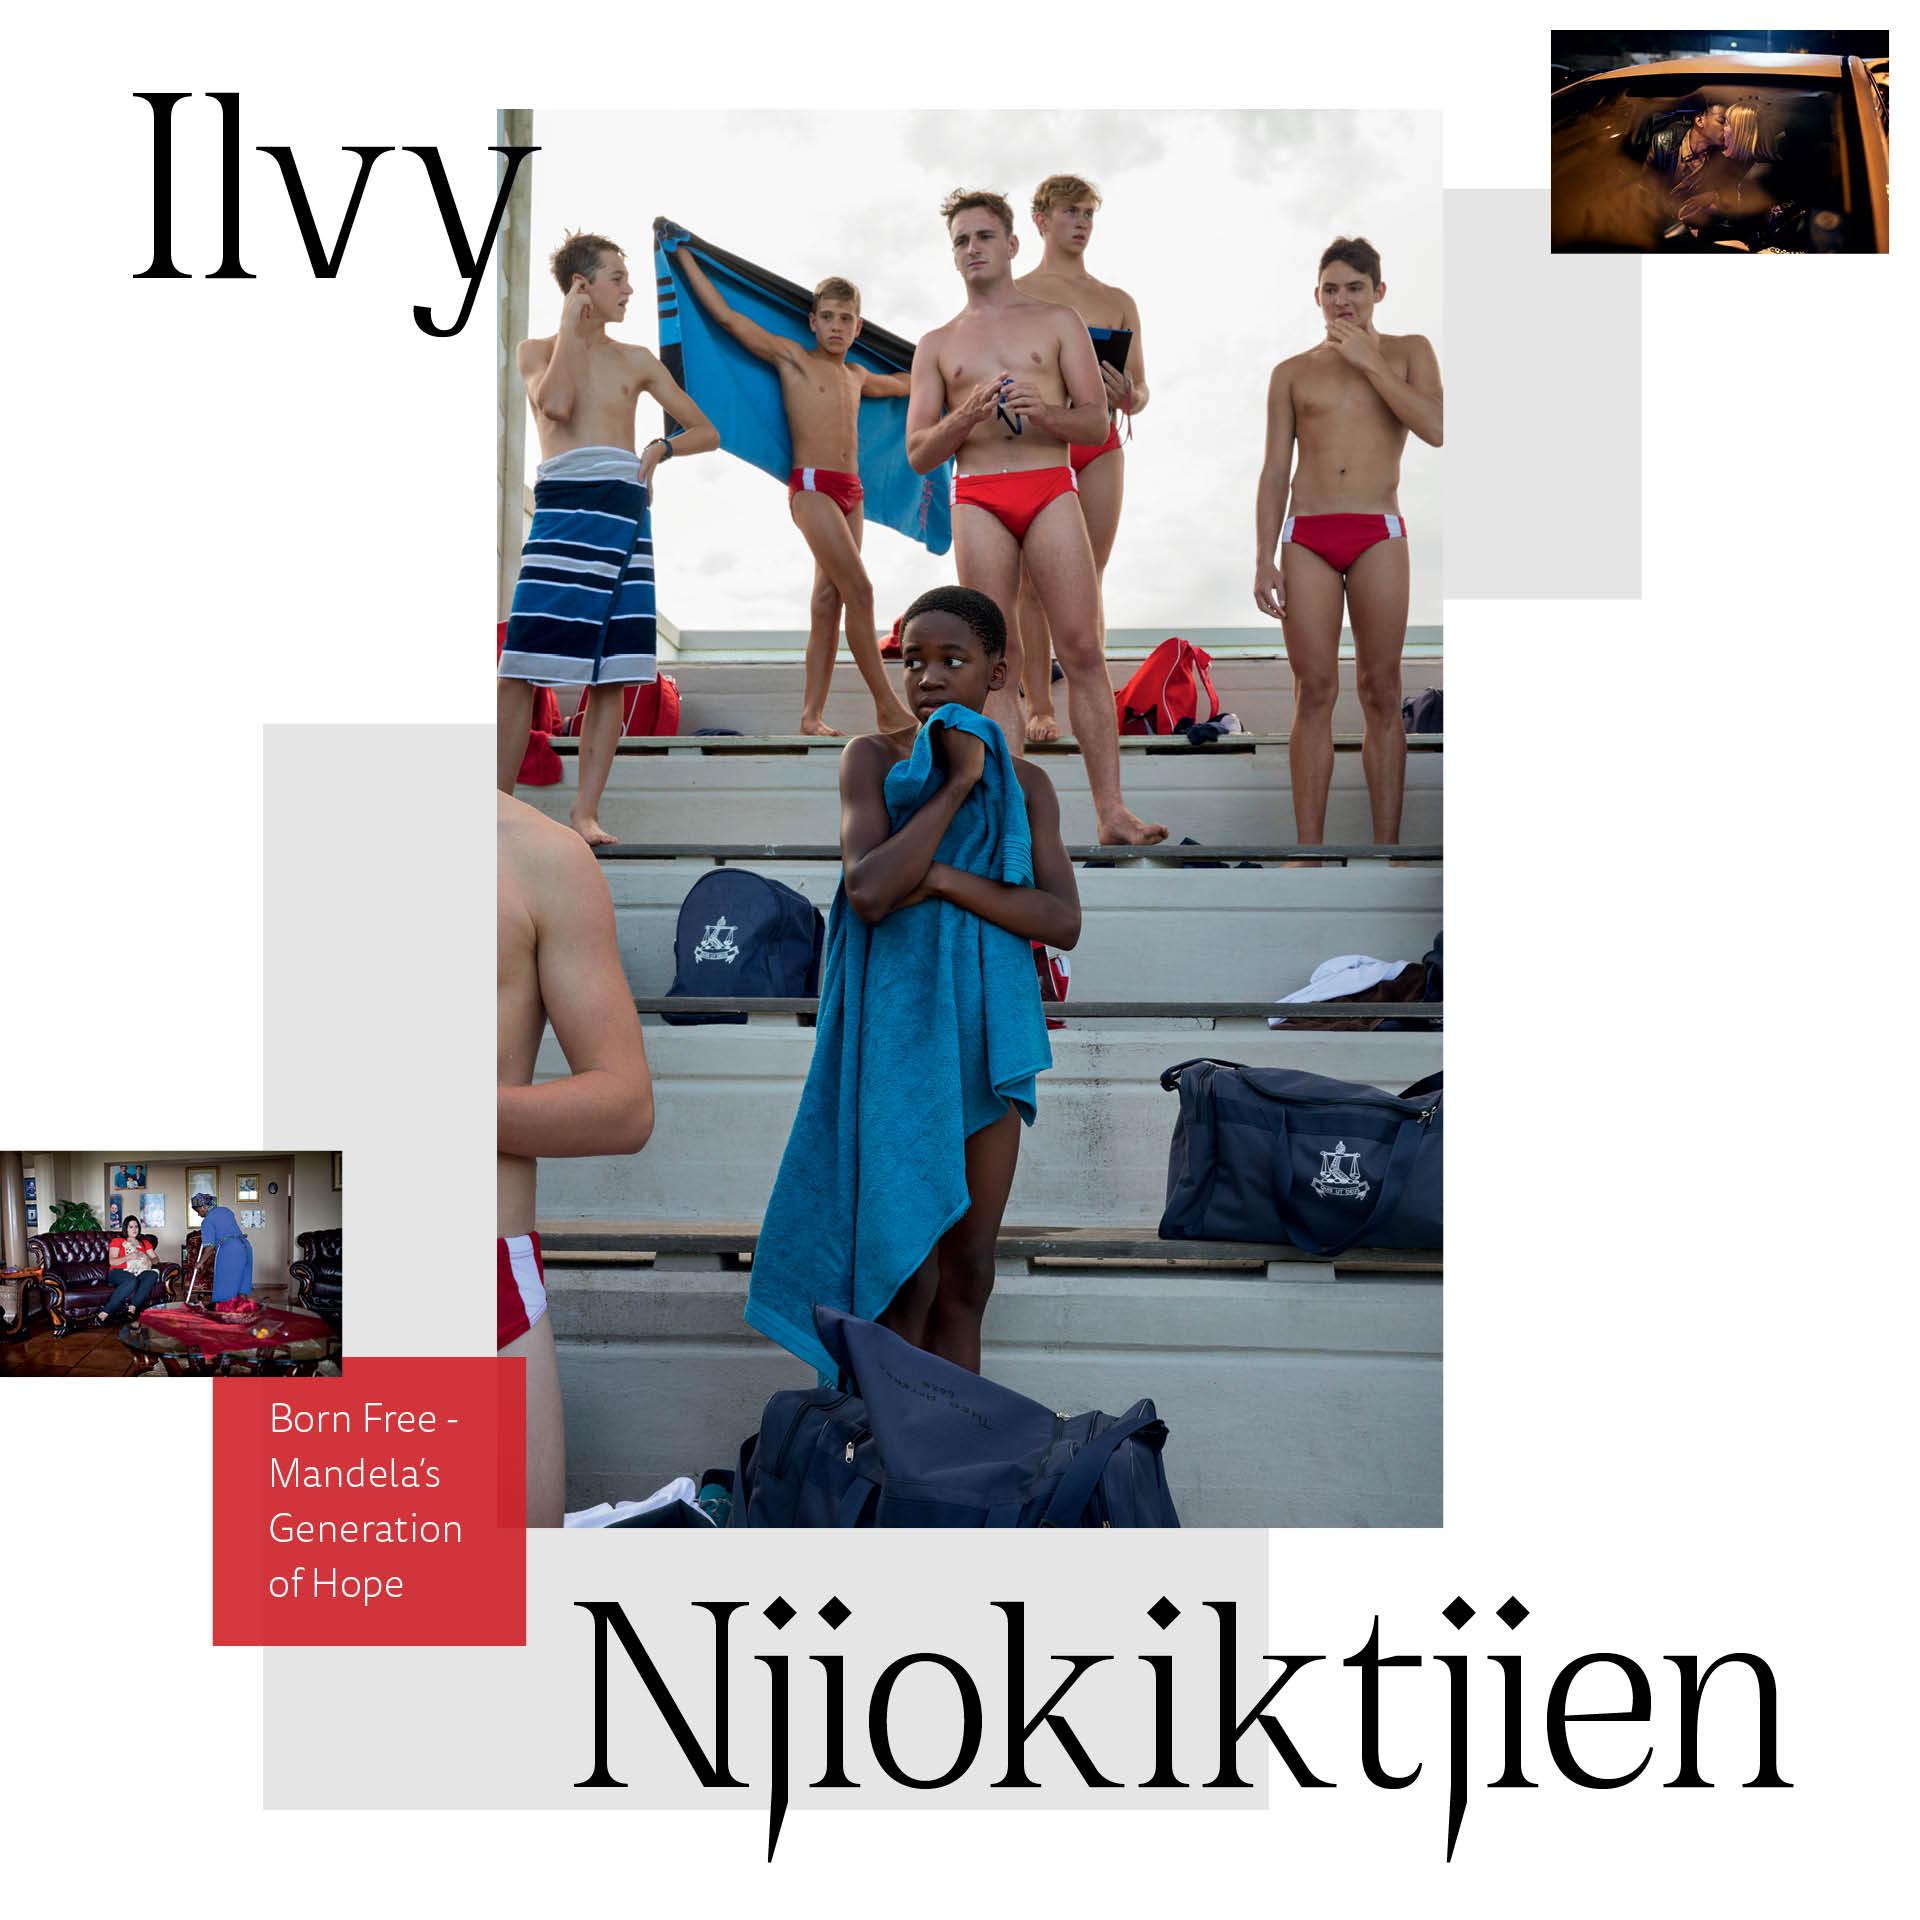 Beyond Artist Ilvy Njiokiktjien